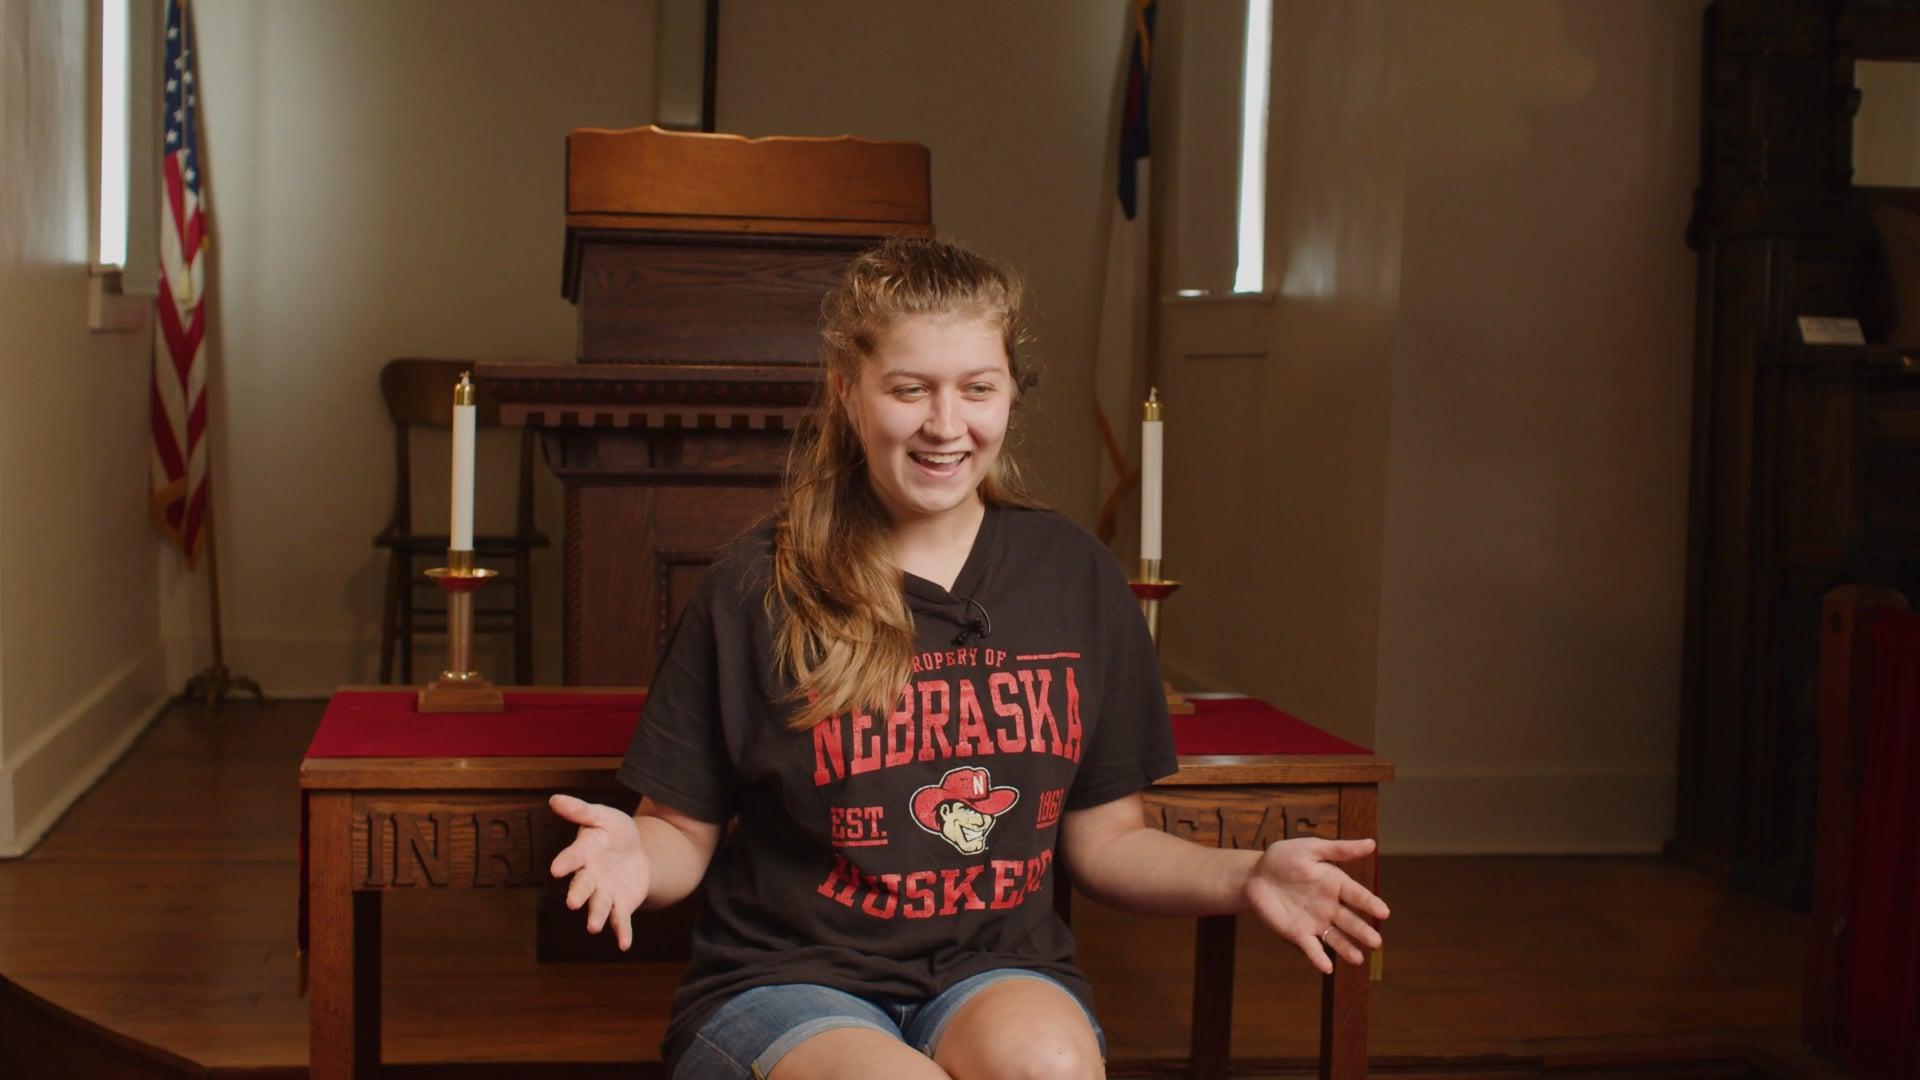 Madison's Testimony